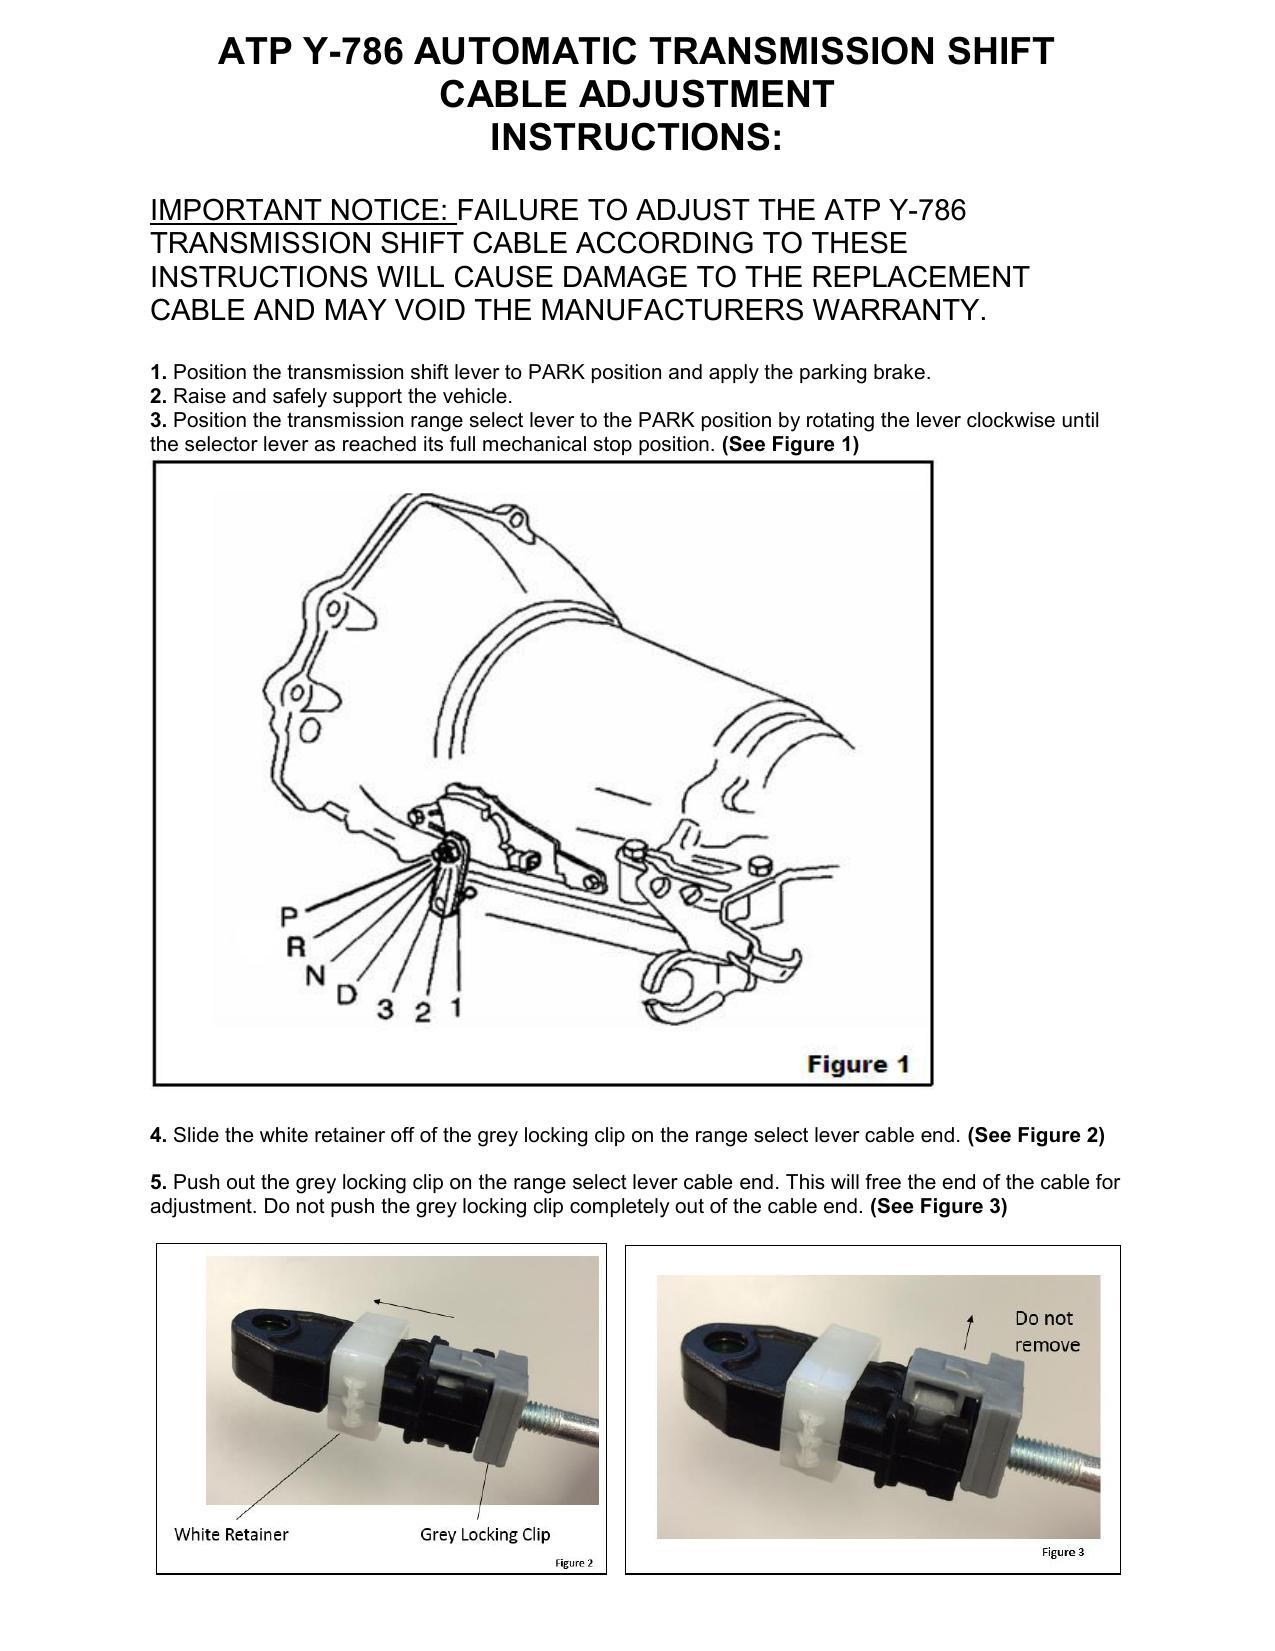 ATP Automotive Y-786 Transhift Cable